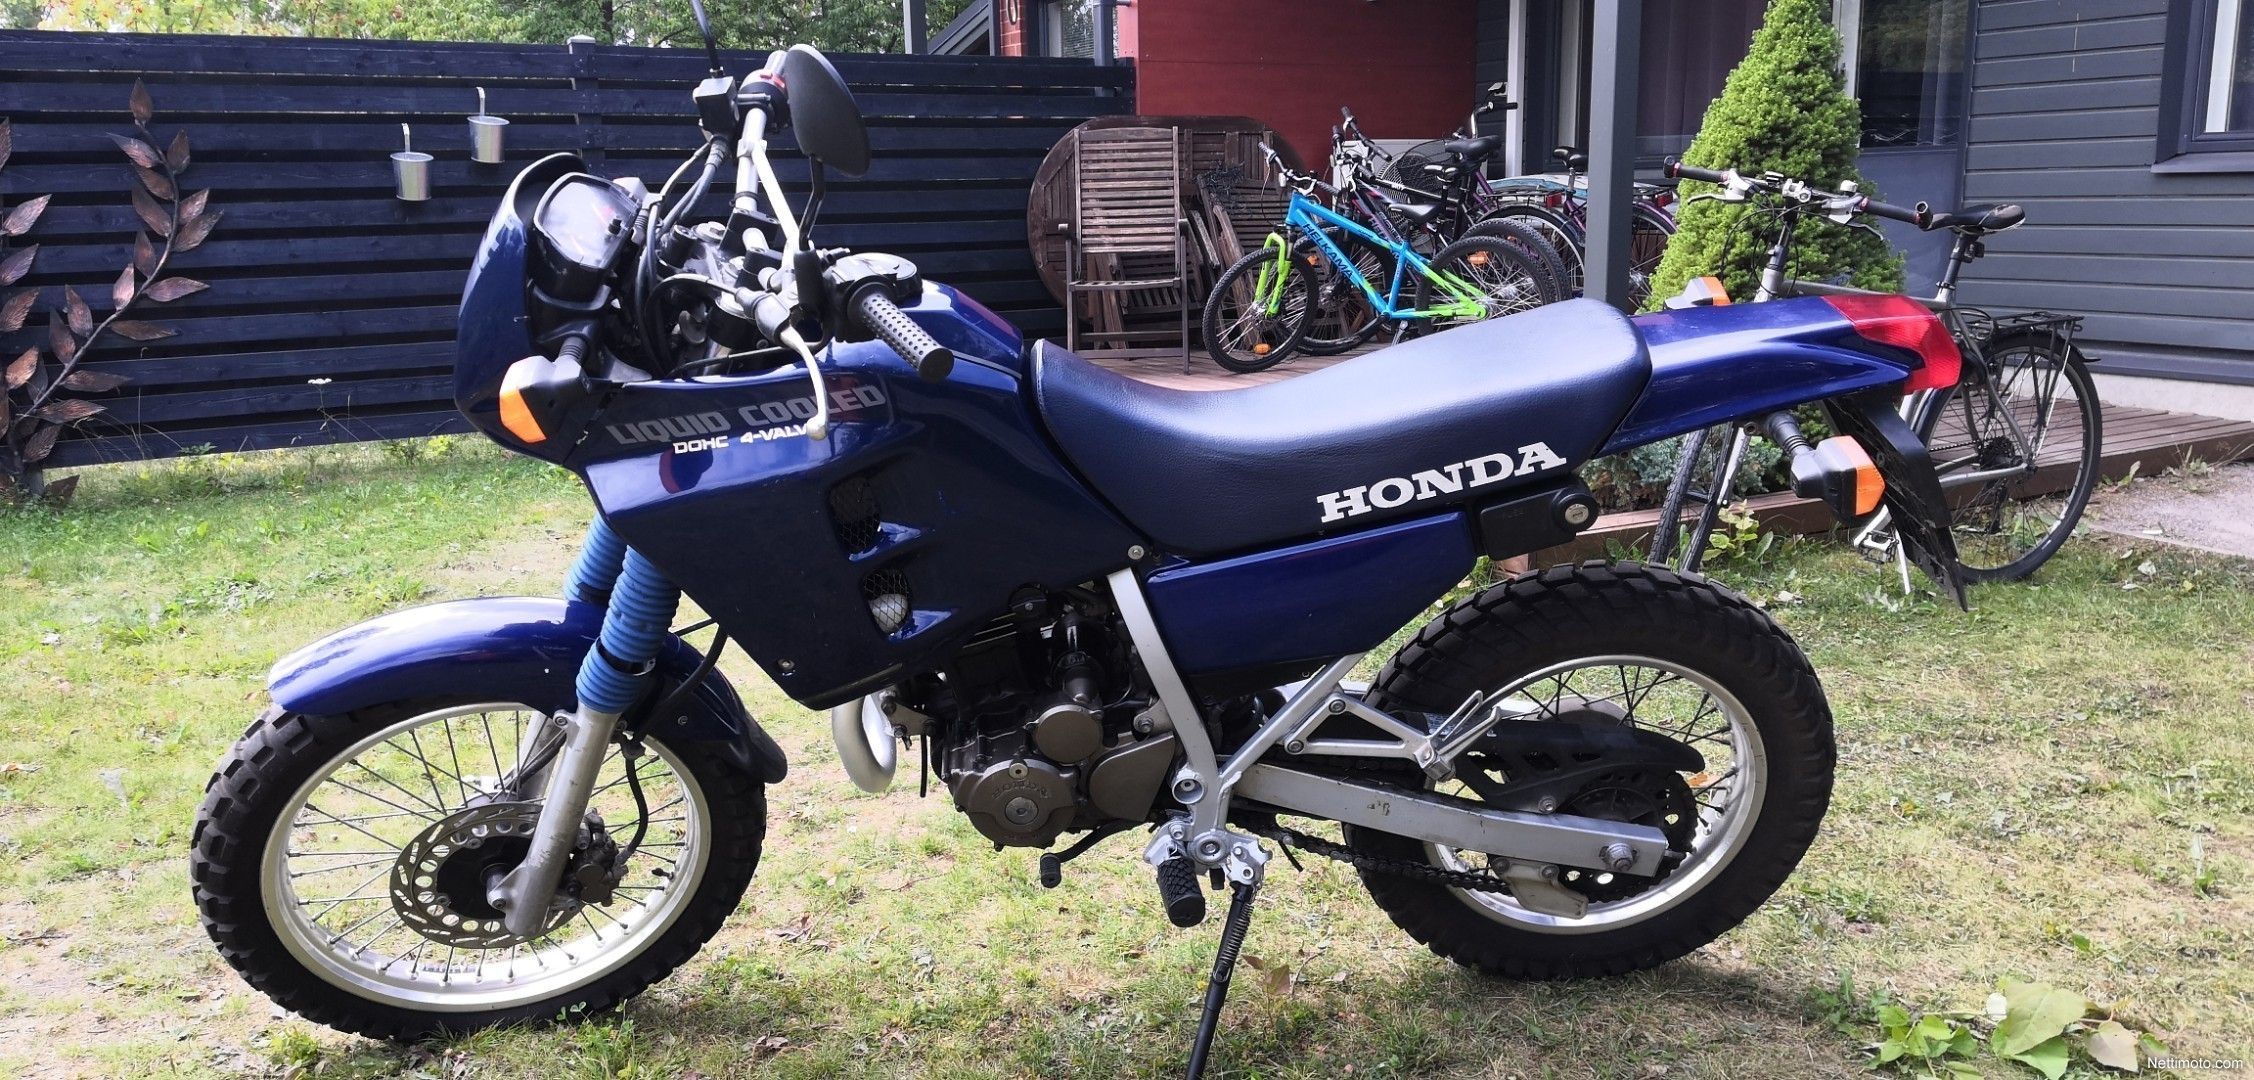 Honda NX 250 Dominator 250 cm³ 1998 - Hyvinkää